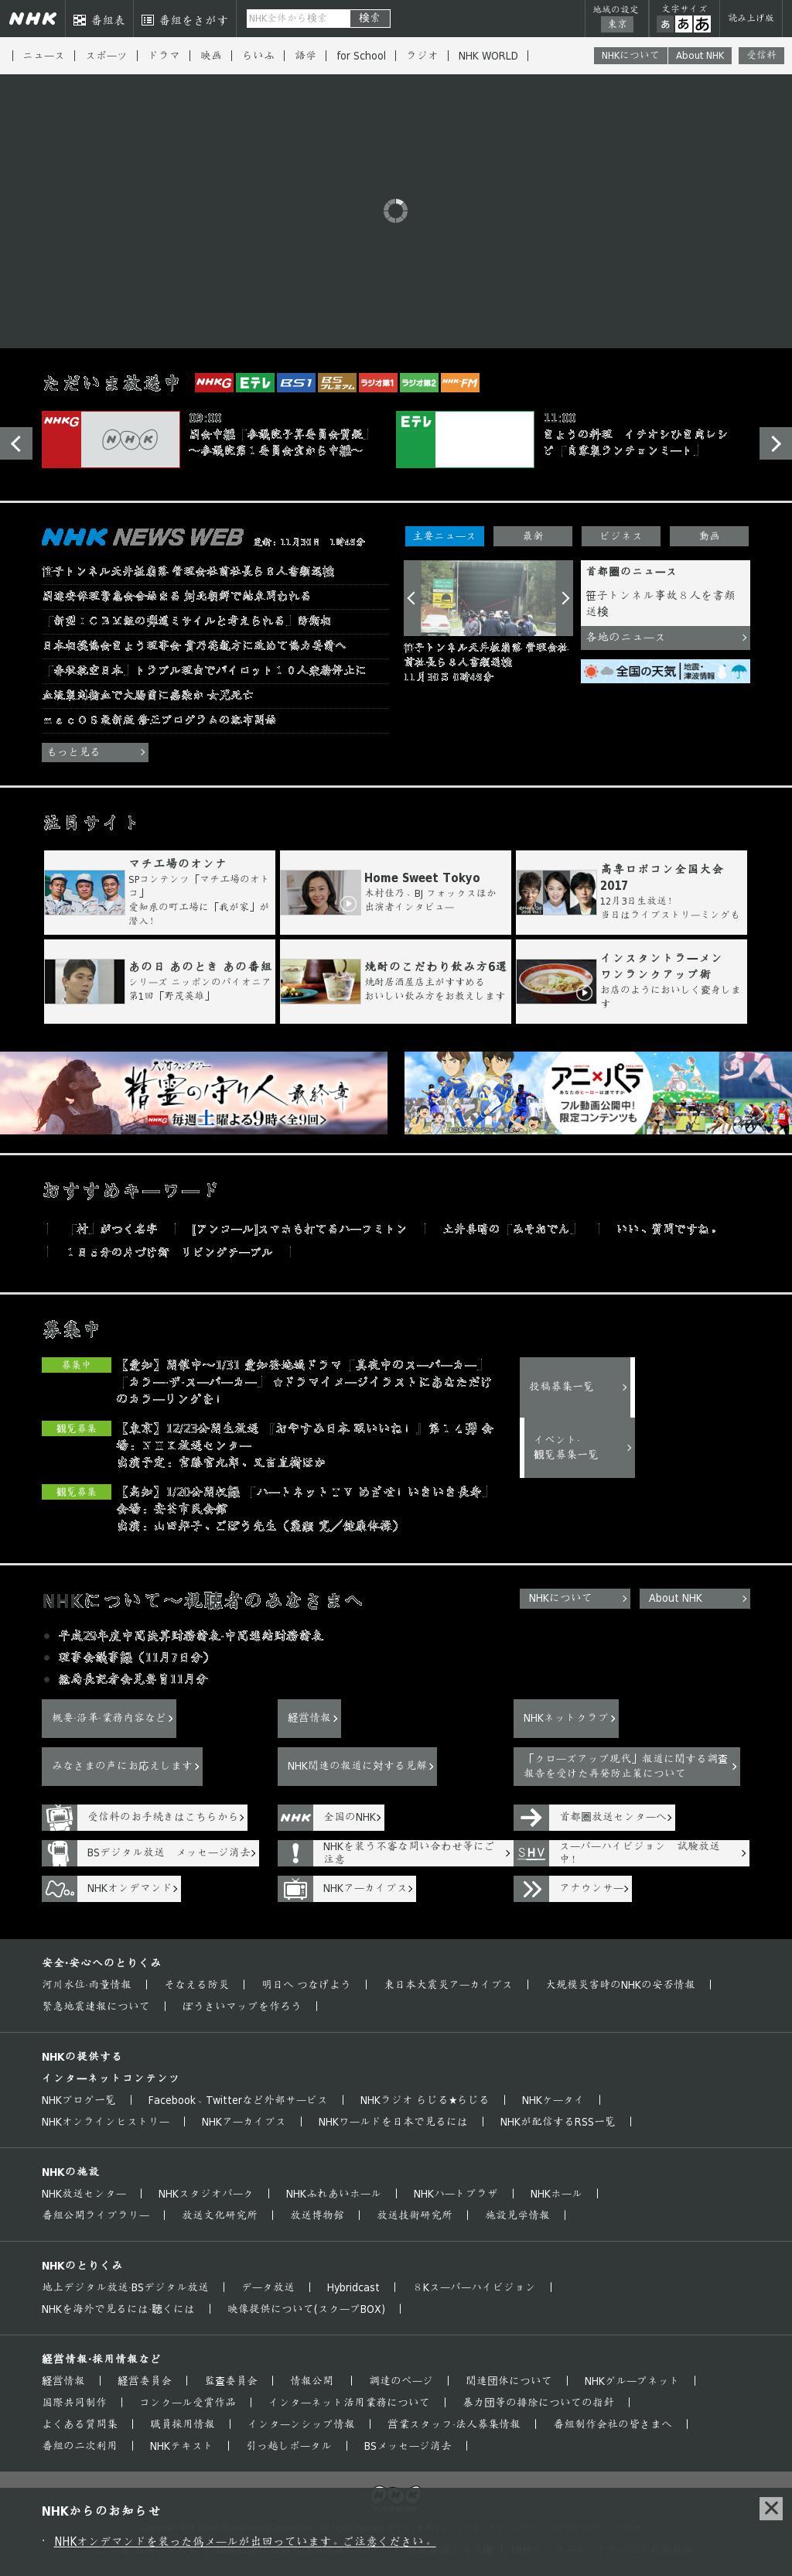 NHK Online at Thursday March 15, 2018, 9:07 a.m. UTC